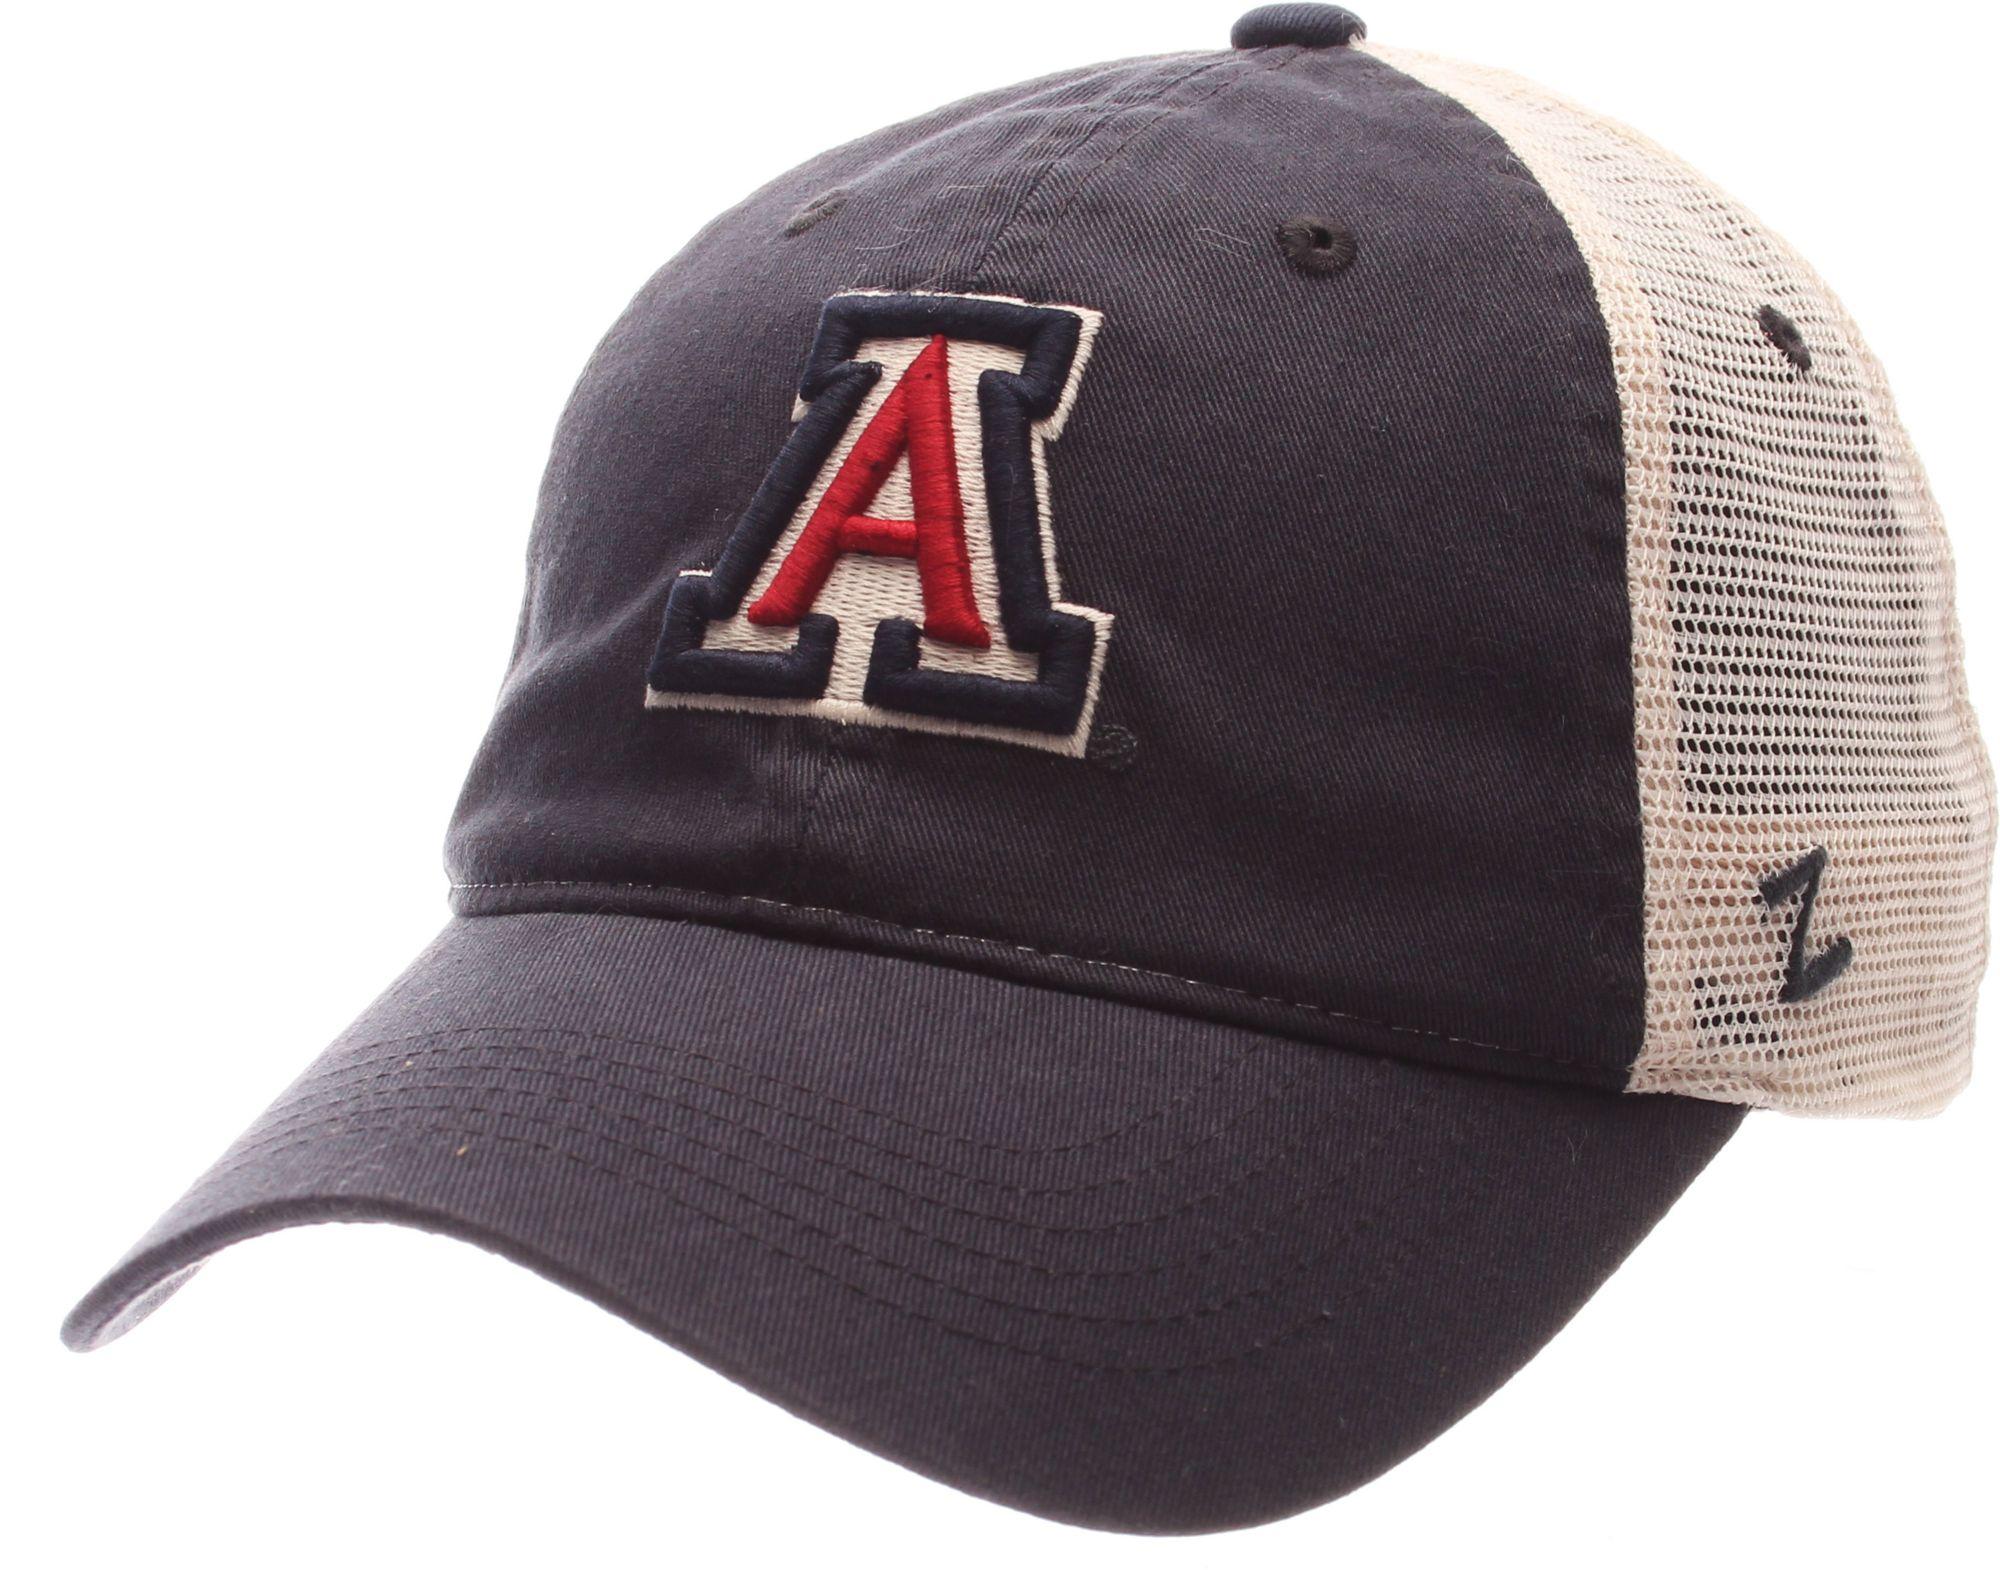 b9fa5a40 ... wholesale zephyr mens arizona wildcats navy white university adjustable  hat 2c824 c2164